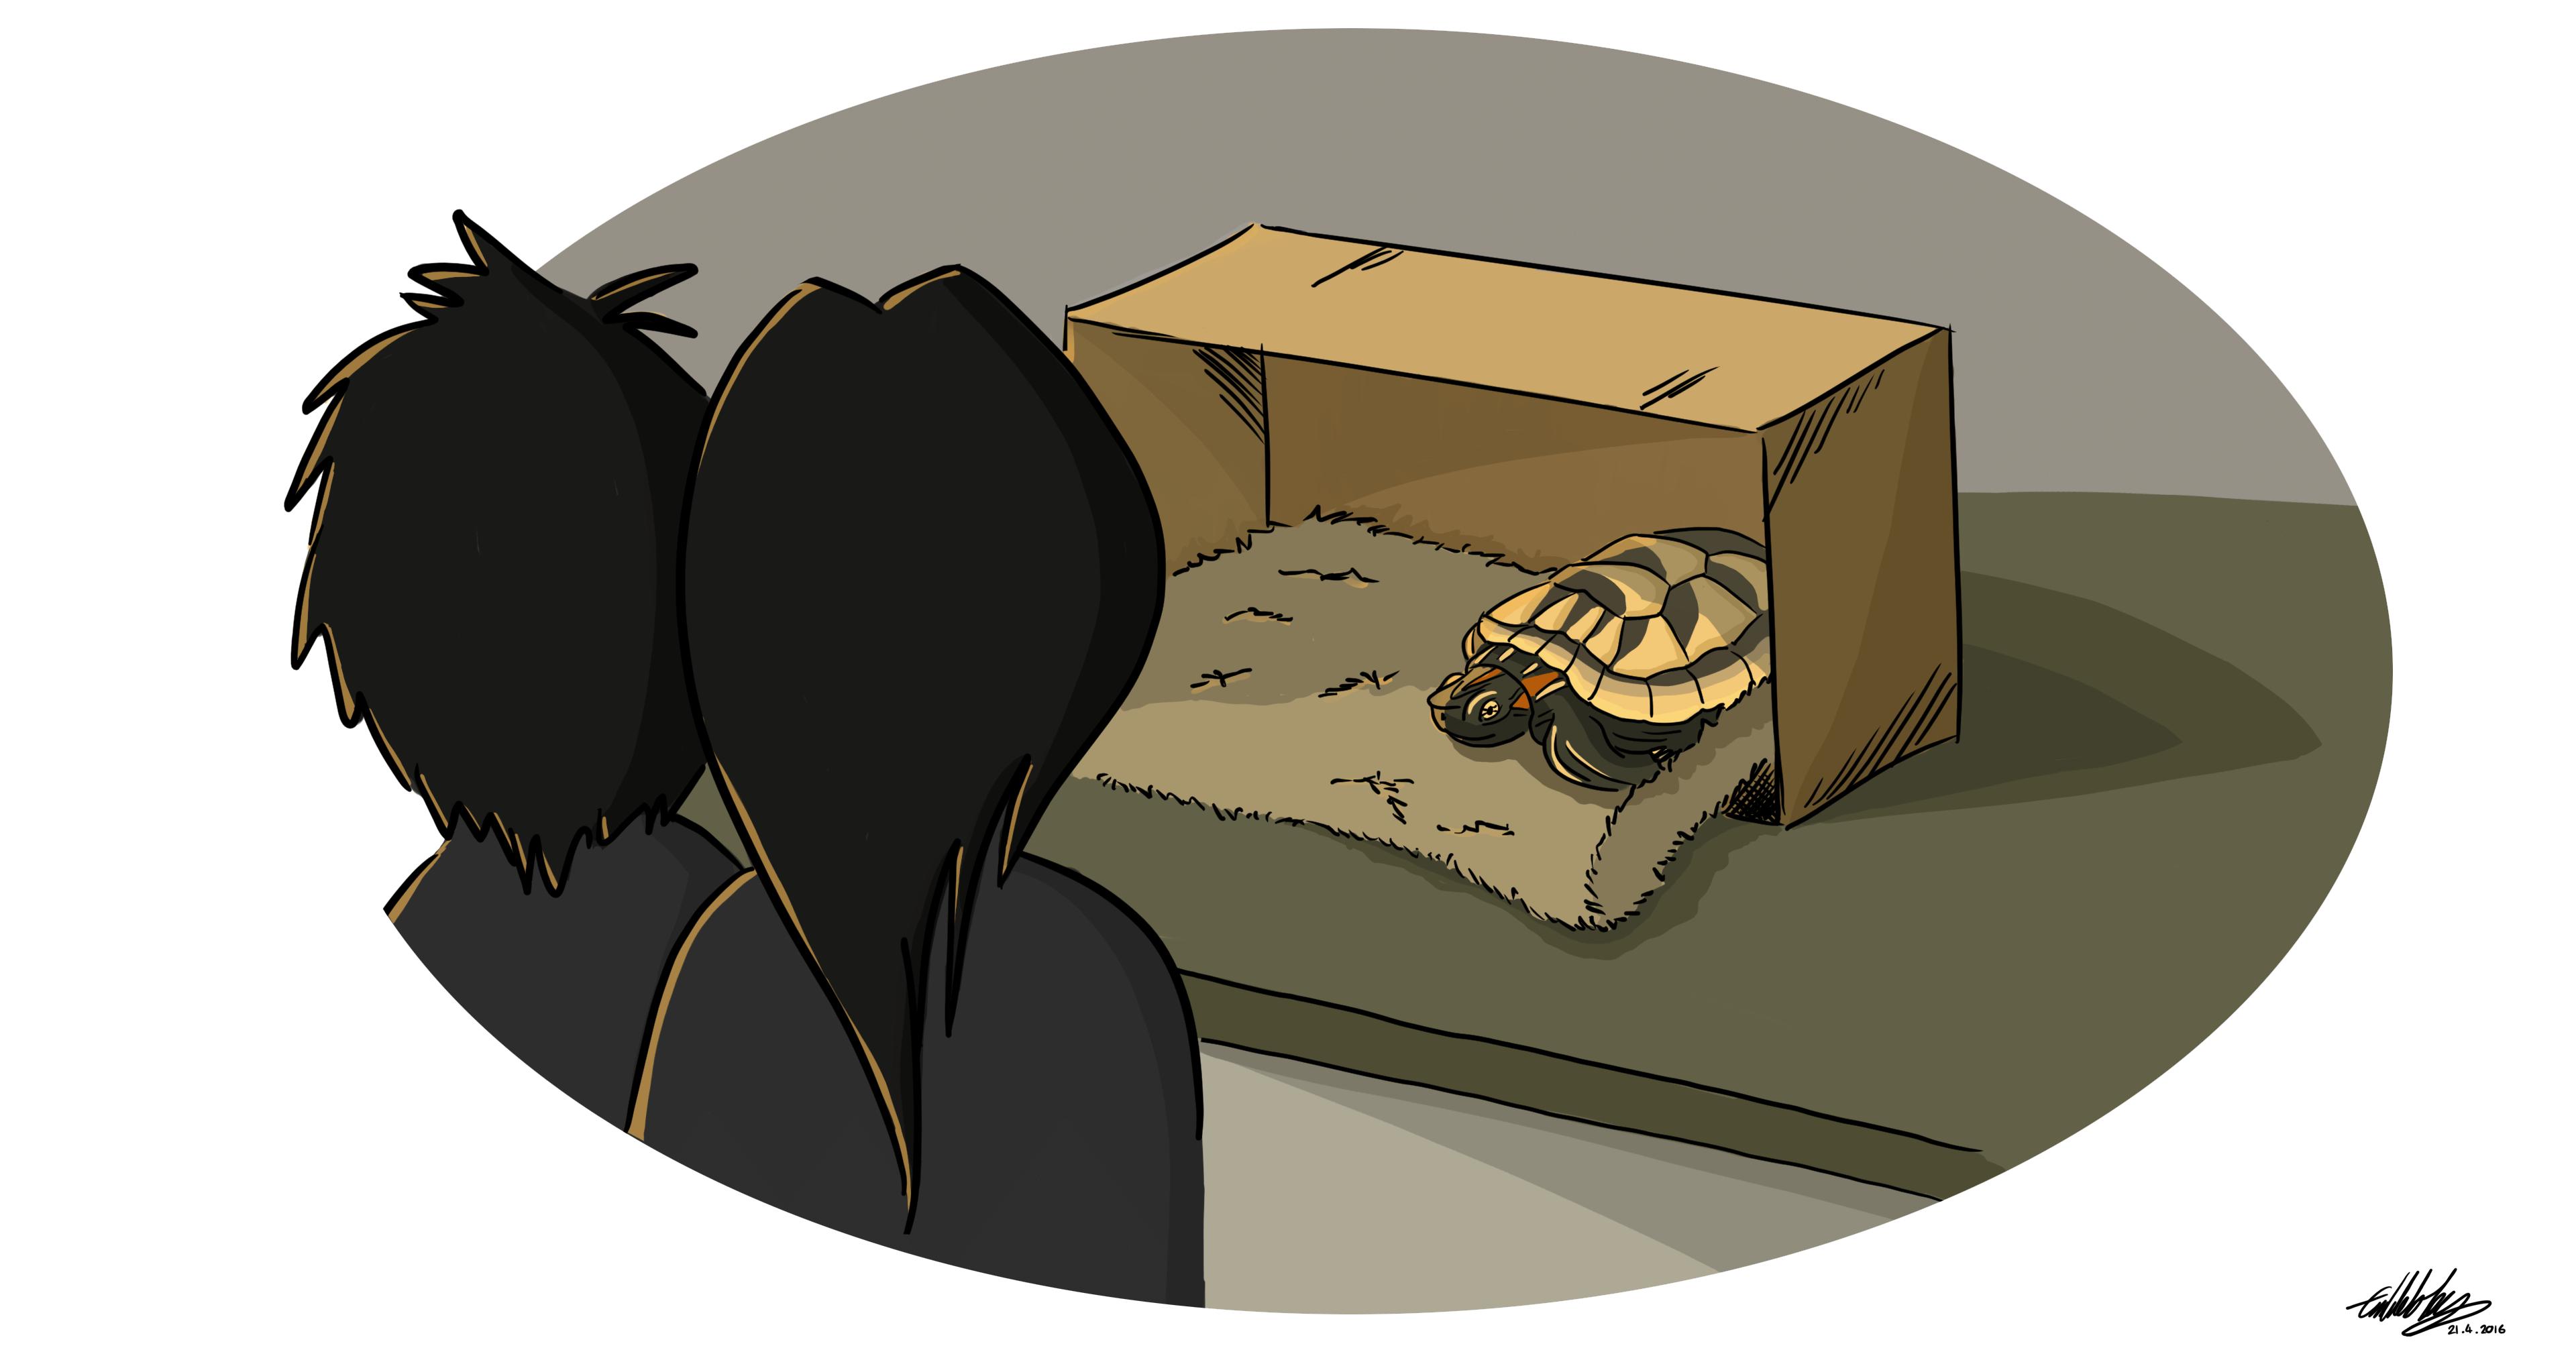 Bringing Him Home